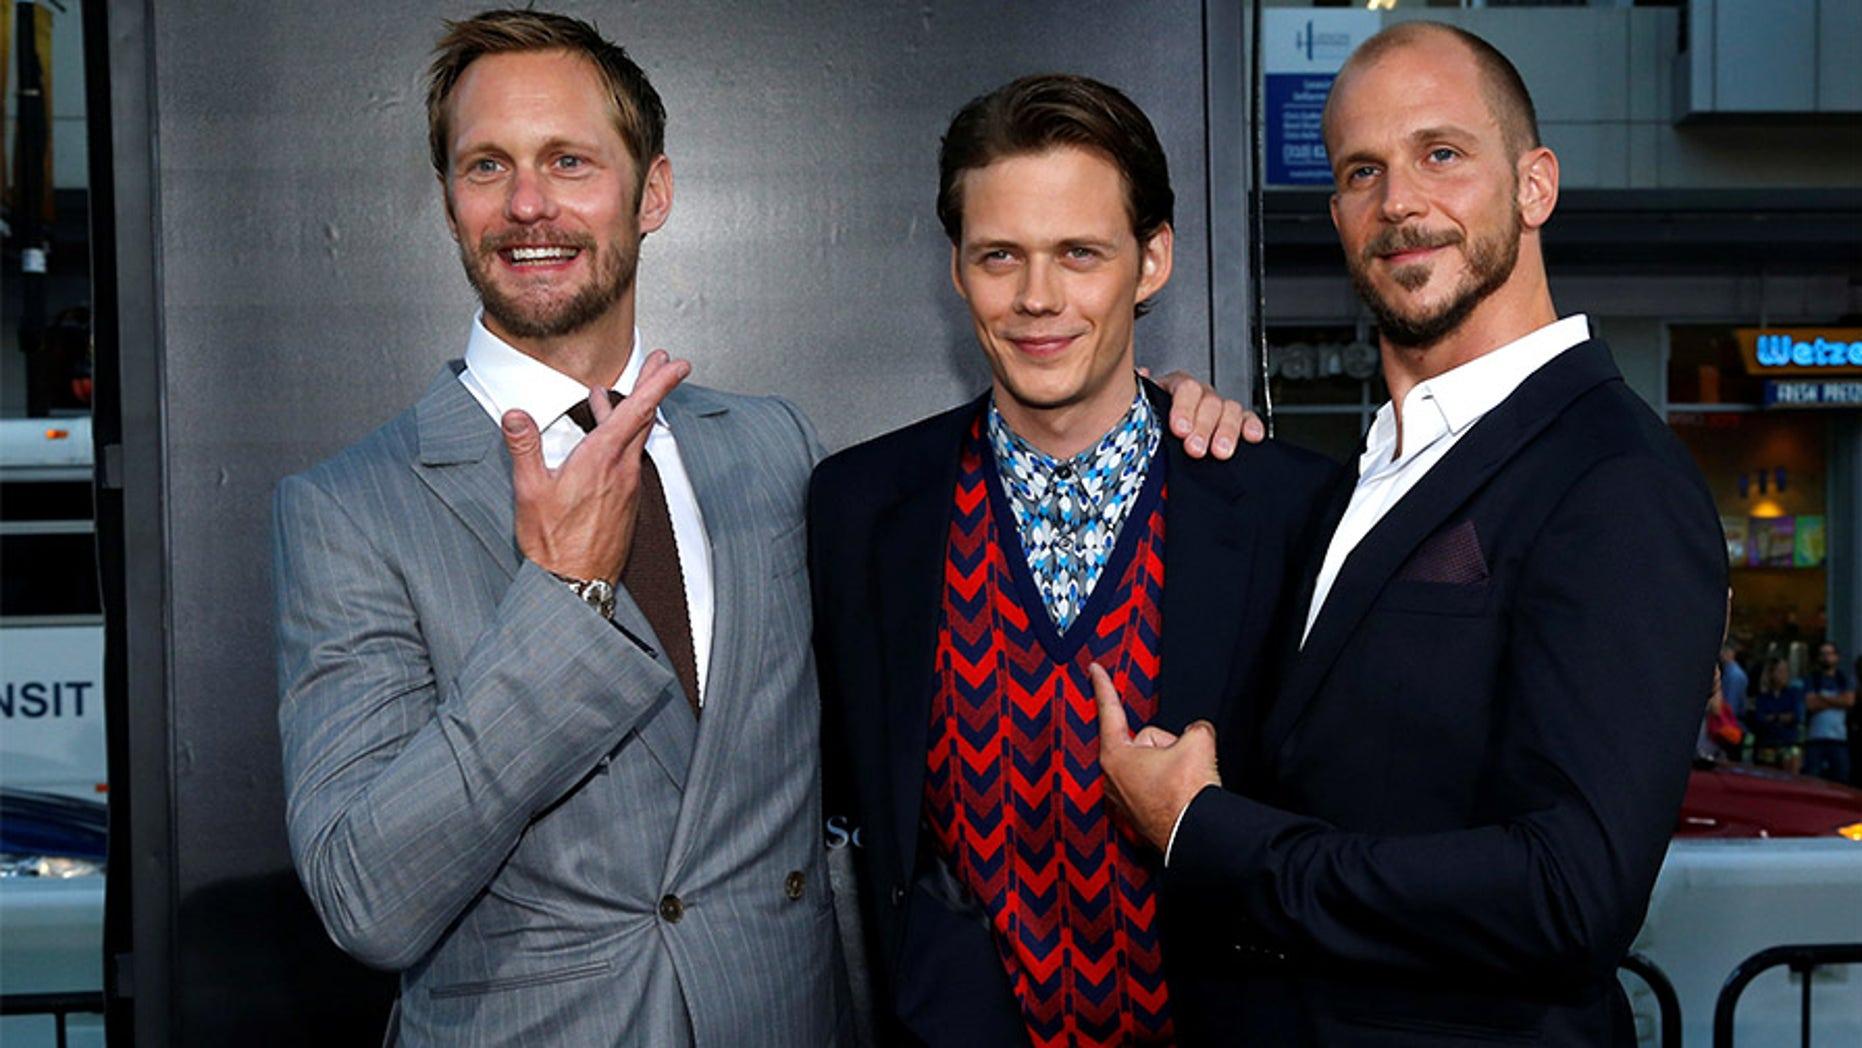 "Cast member Bill Skarsgard (C) poses with his brothers Alexander Skarsgard (L) and Gustaf Skarsgard at the premiere for ""It"" in Los Angeles, California, September 5, 2017."